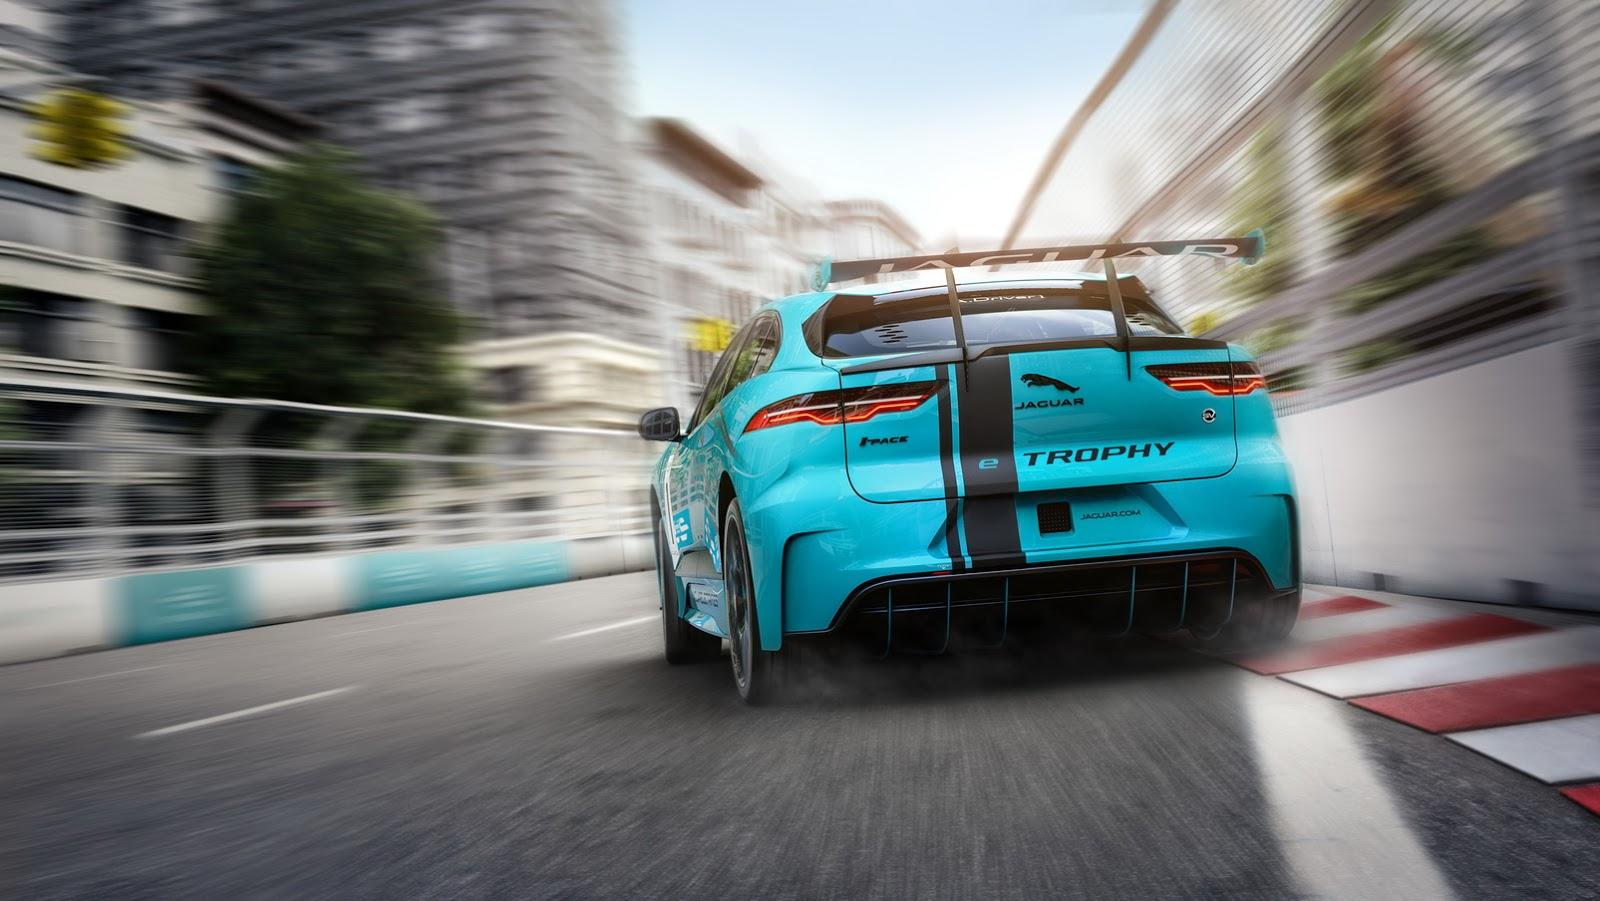 jaguar-ipace-race-car-iaa-33